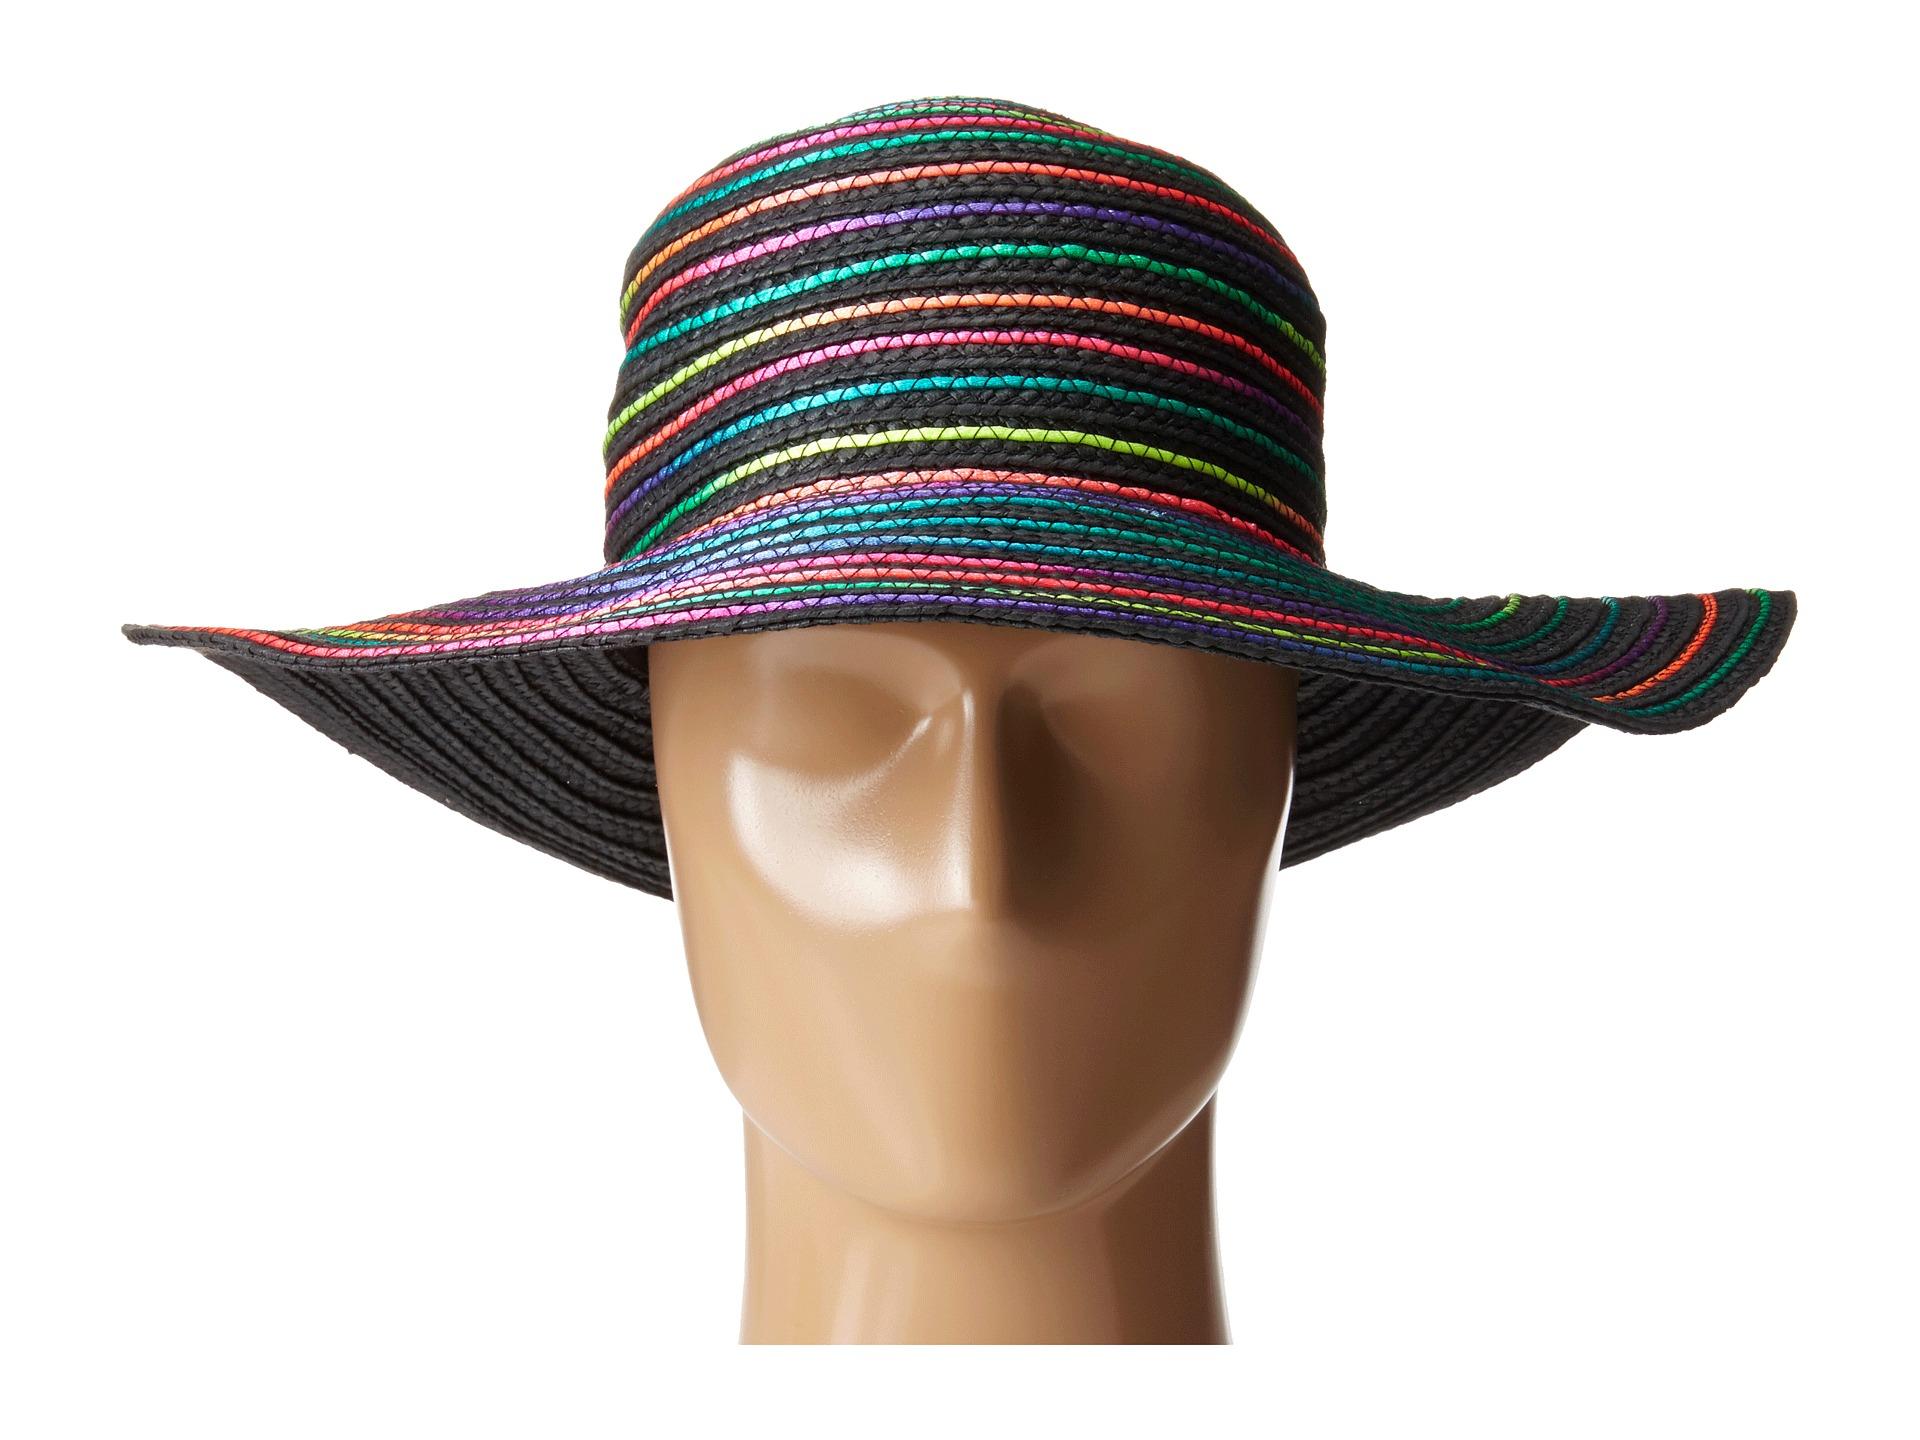 724900f6bfb483 Betsey Johnson Rainbow Swirl Floppy Hat in Gray - Lyst